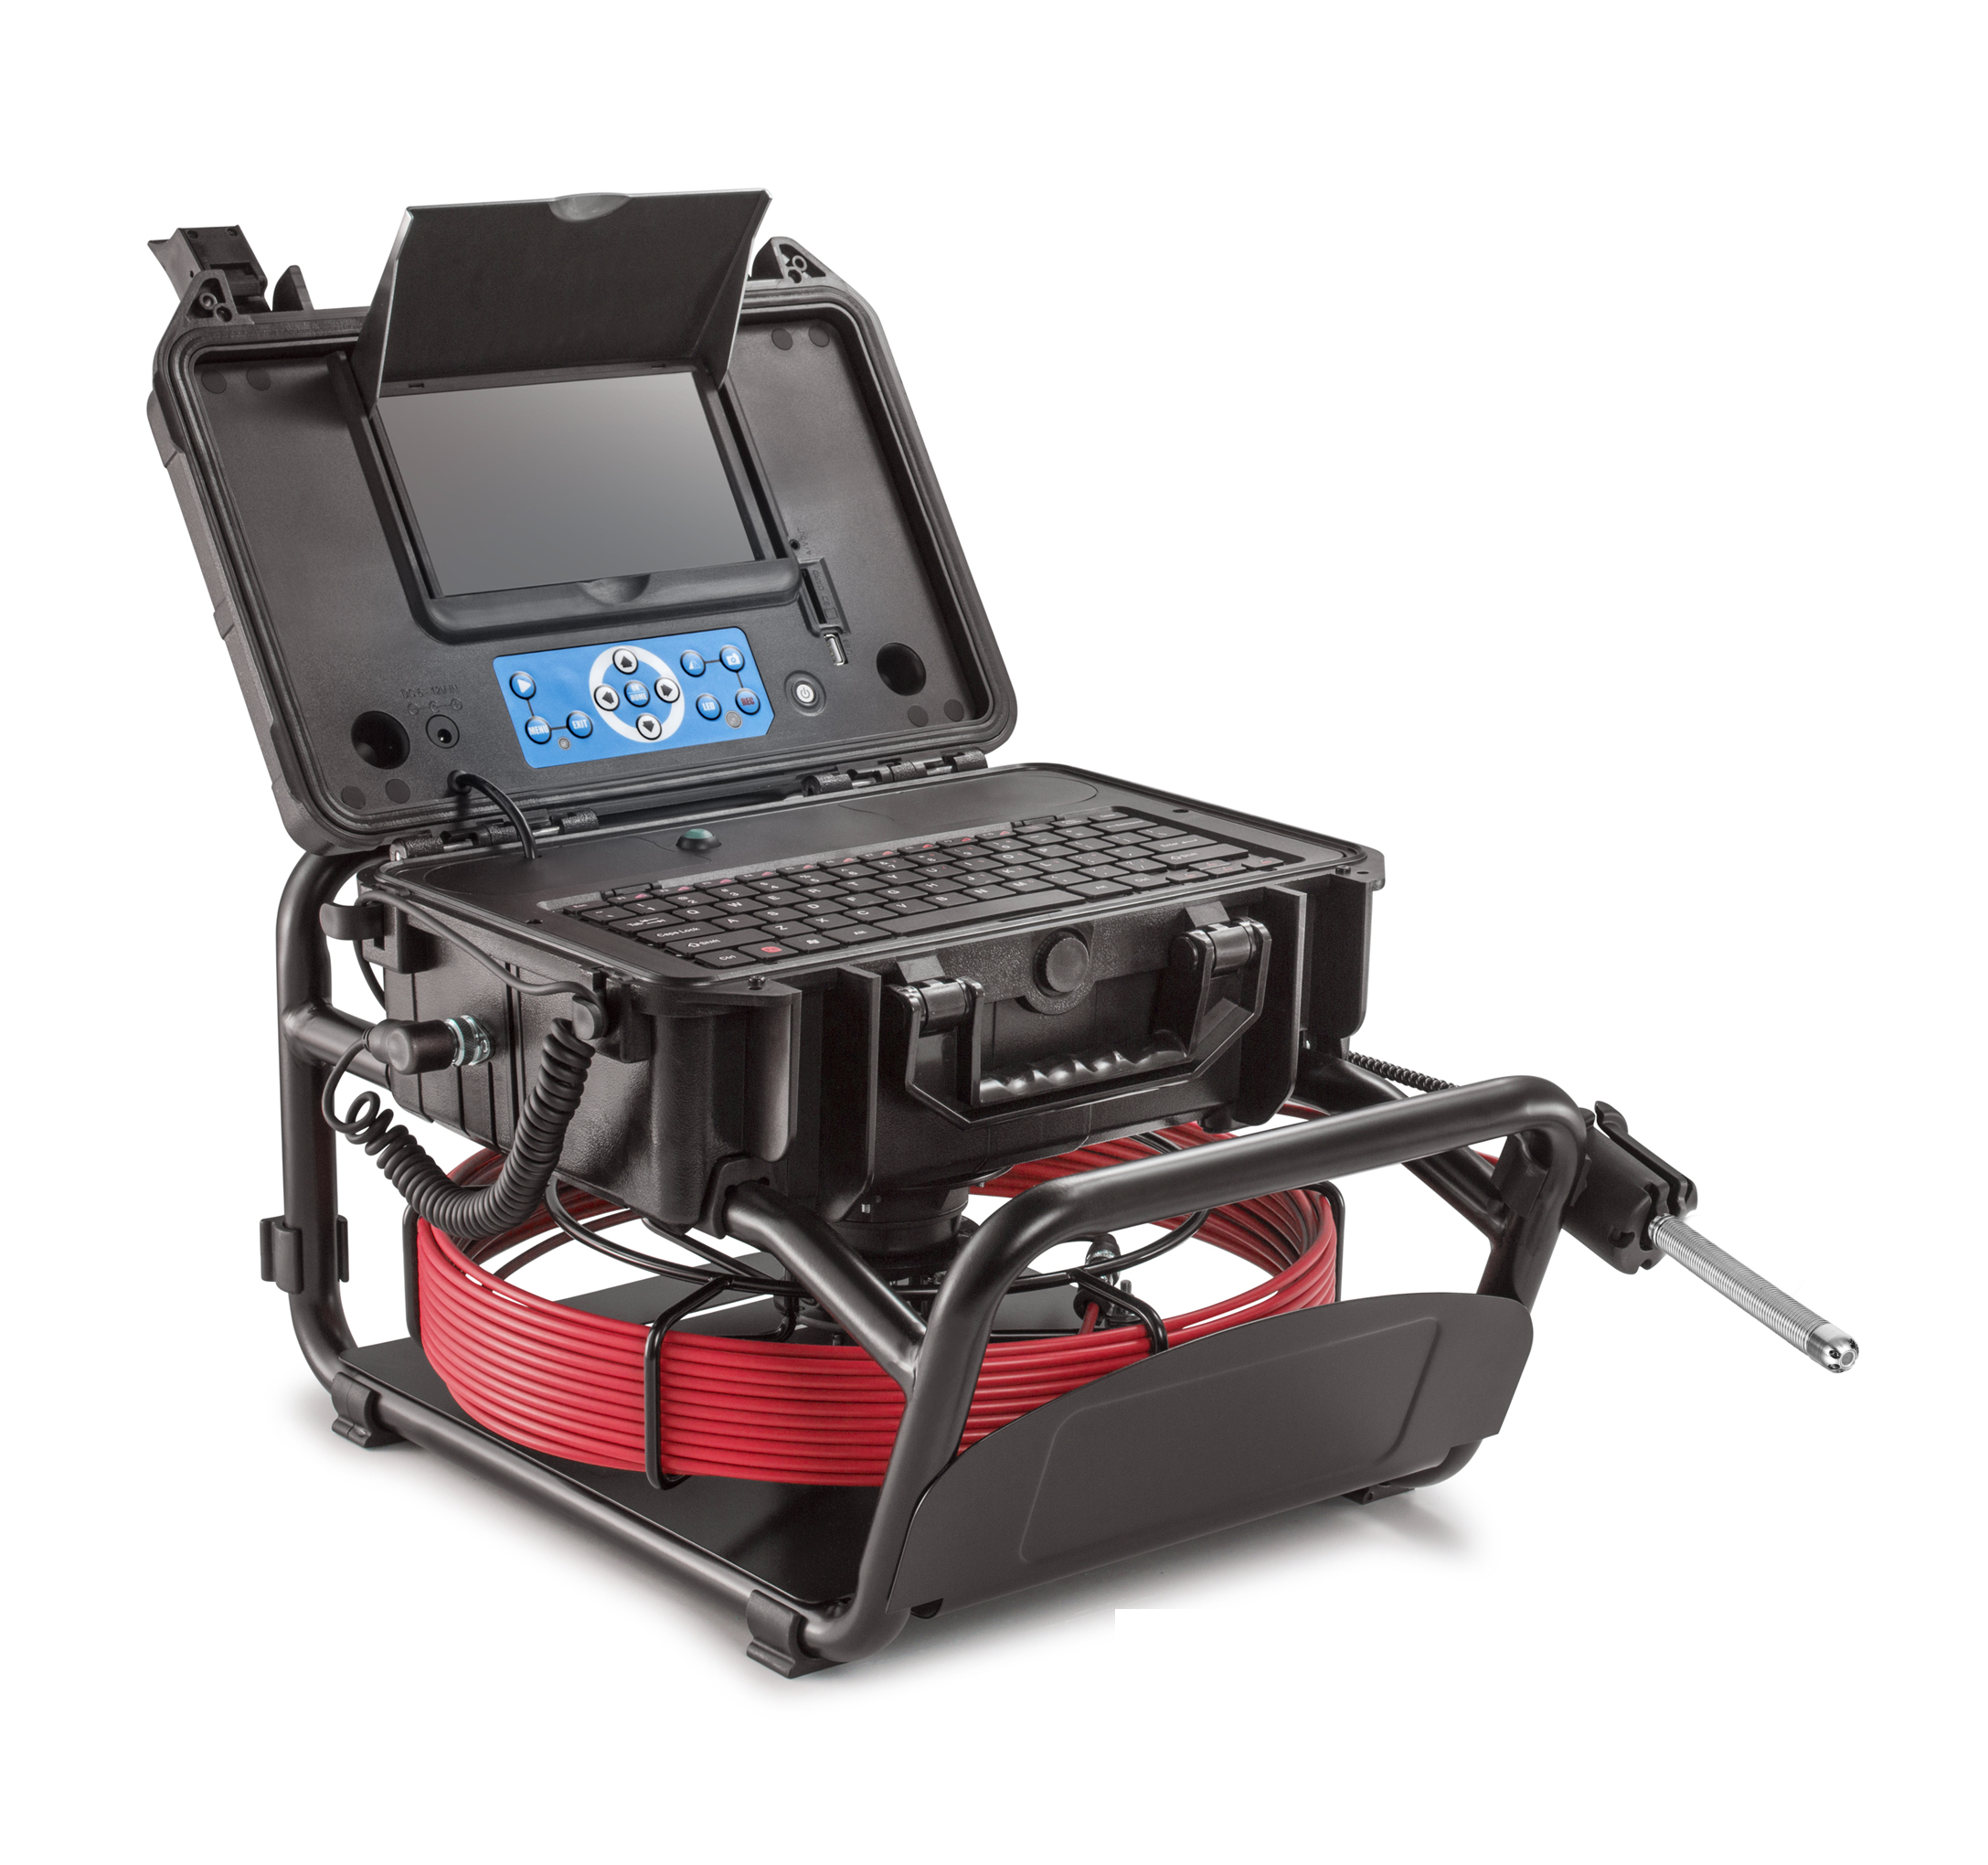 Camara de inspeccion de tuberias Panter F27 Mini